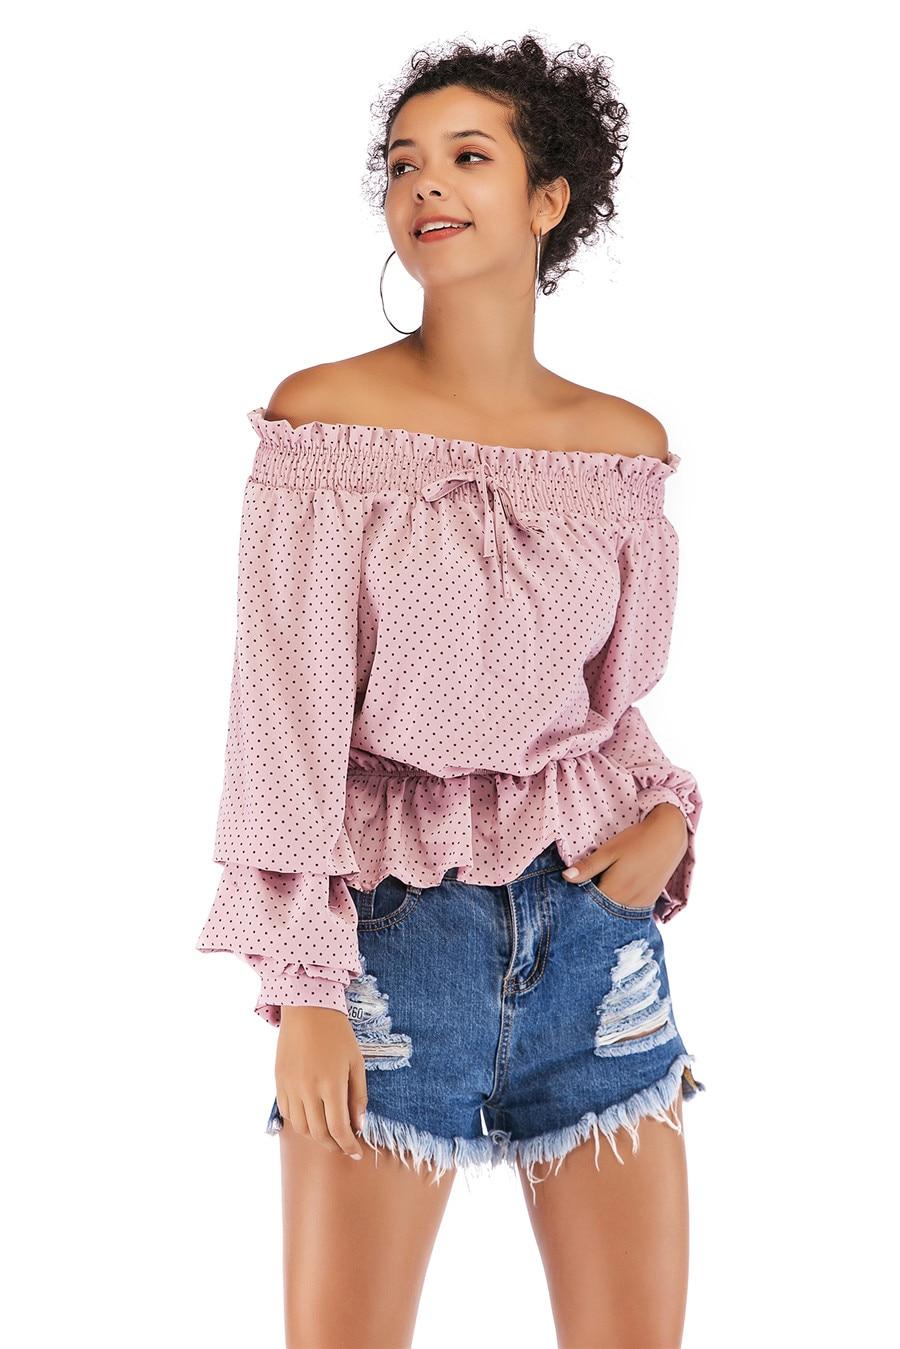 Gladiolus Chiffon Blouse Women 2019 Spring Autumn Long Sleeve Polka Dot Off Shoulder Sexy Blouses Women Shirts Ruffles Blusas (30)